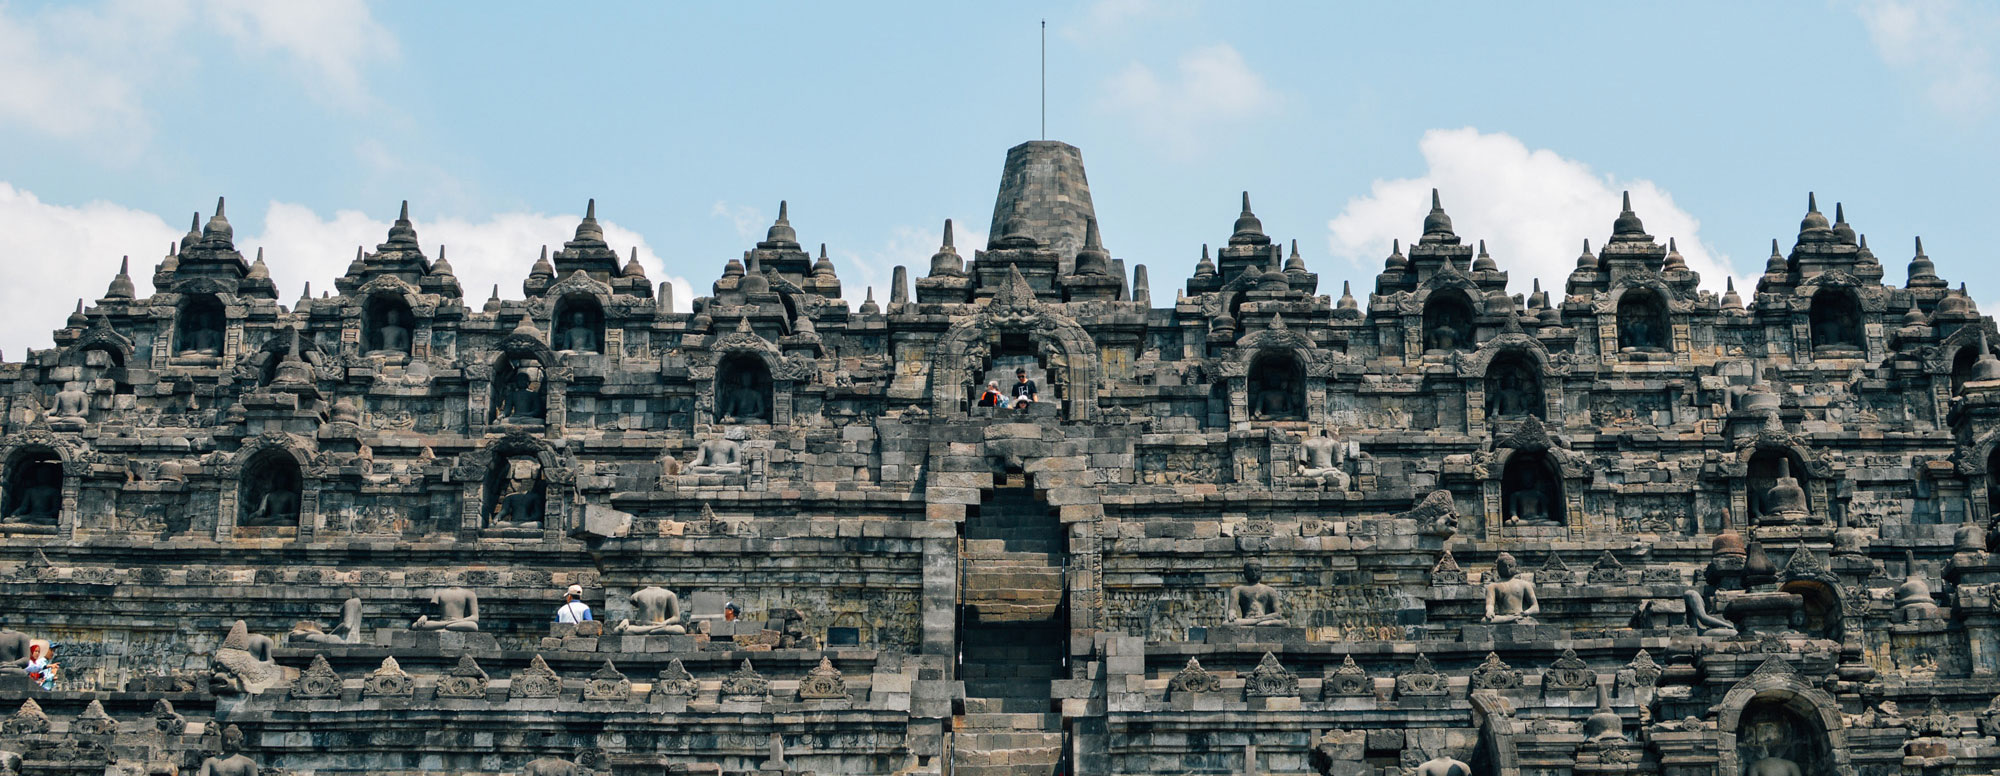 borobudur2 - Jogyakarta met Tempels